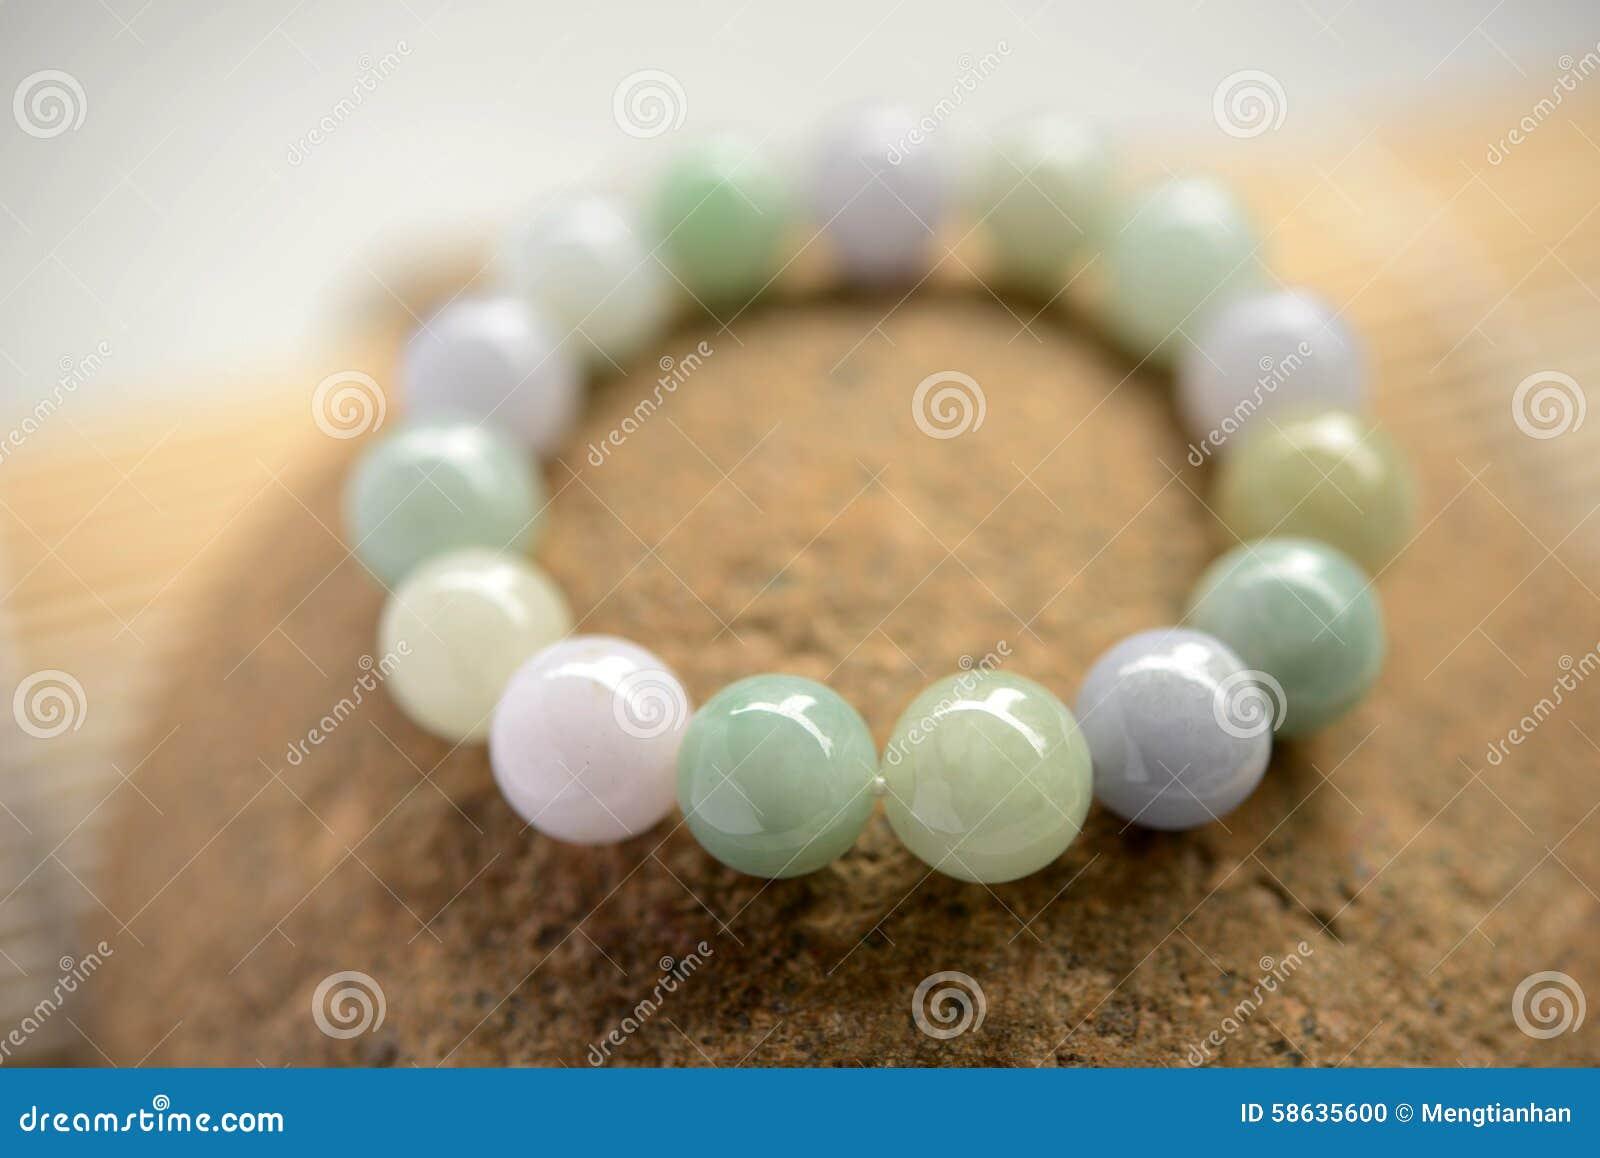 3bad55e277cf1 A Bracelet Of Glittering Jade Beads Stock Photo - Image of jadeite ...